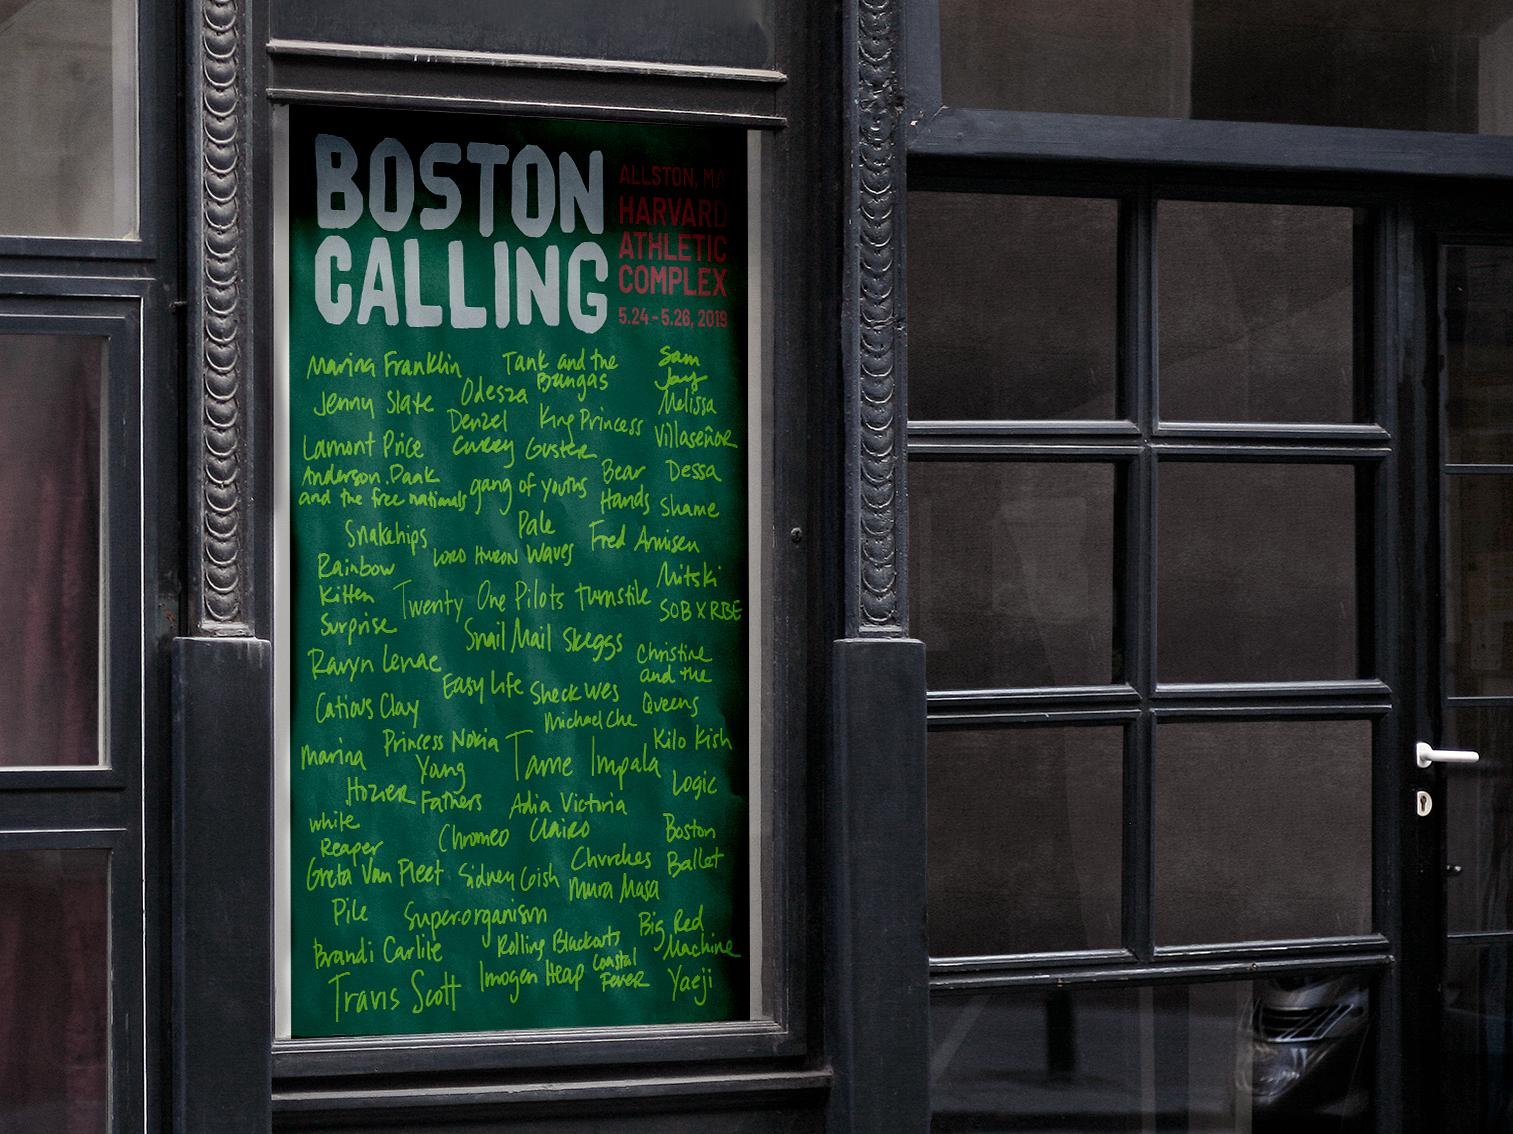 Boston Calling Poster allston bands band poster festival poster design poster poster art boston calling boston